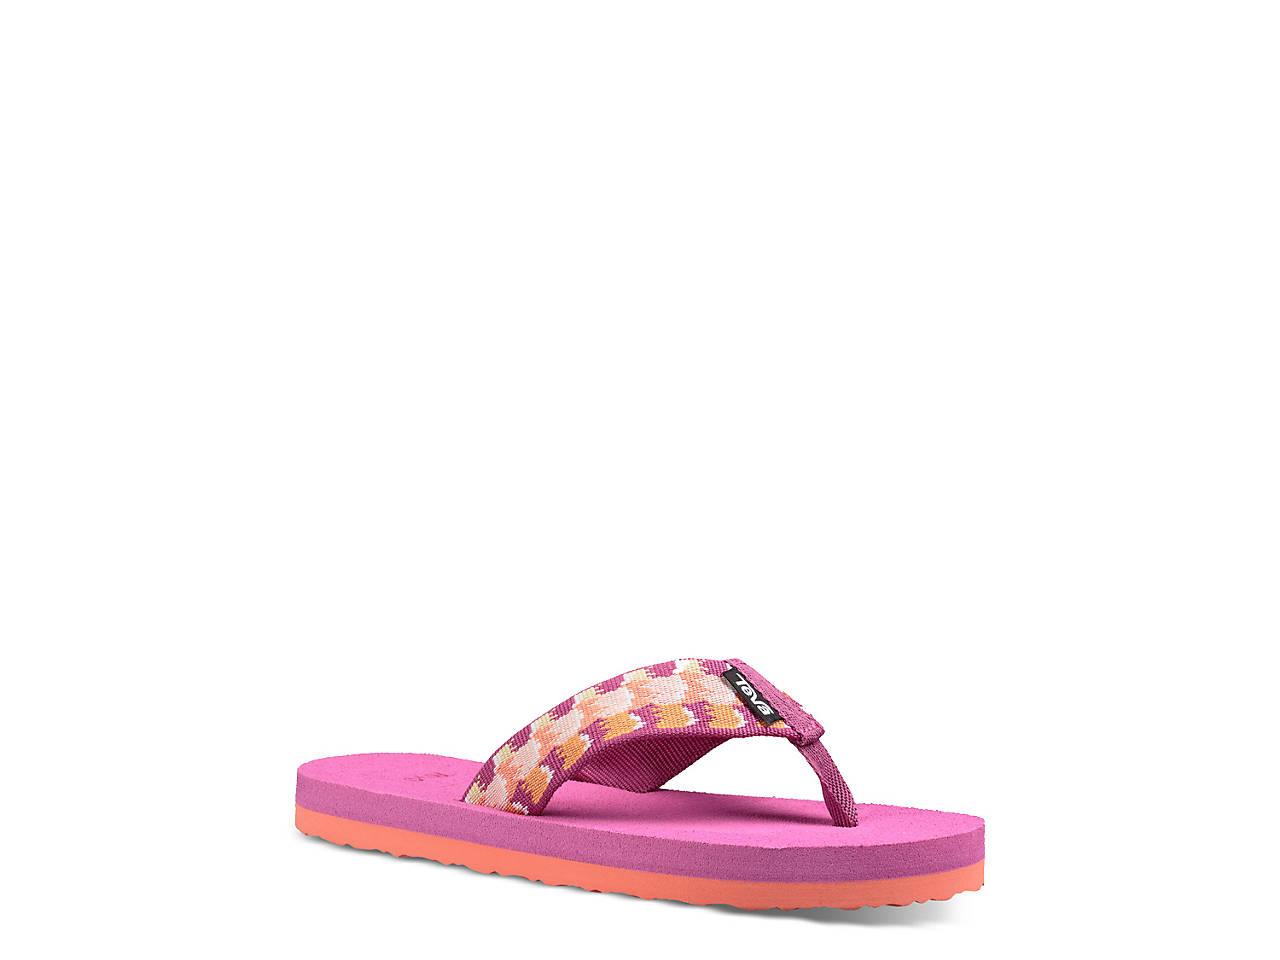 b6db1f422 Teva Mush II Toddler   Youth Flip Flop Kids Shoes